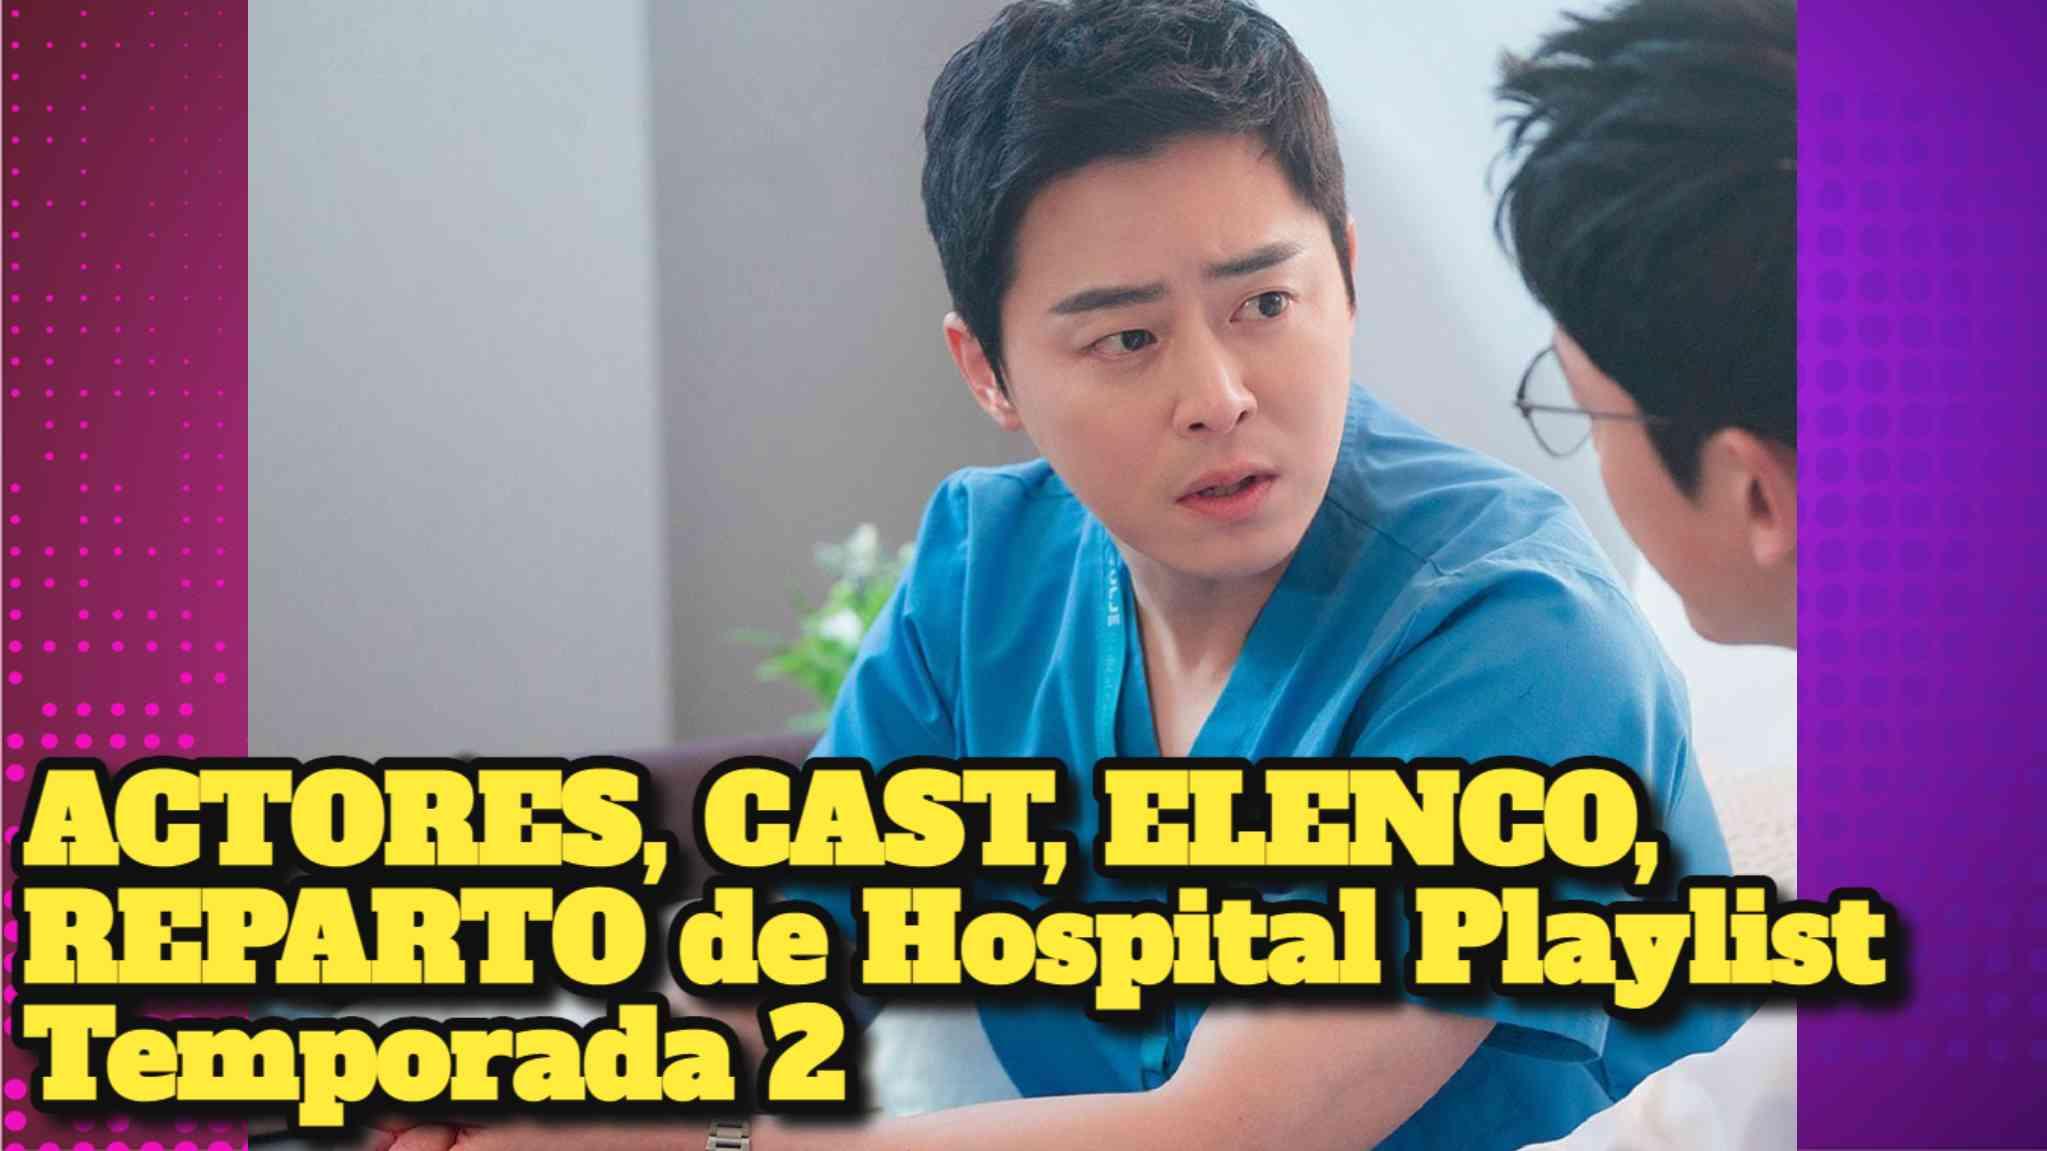 ACTORES, CAST, ELENCO, REPARTO de Hospital Playlist Temporada 2